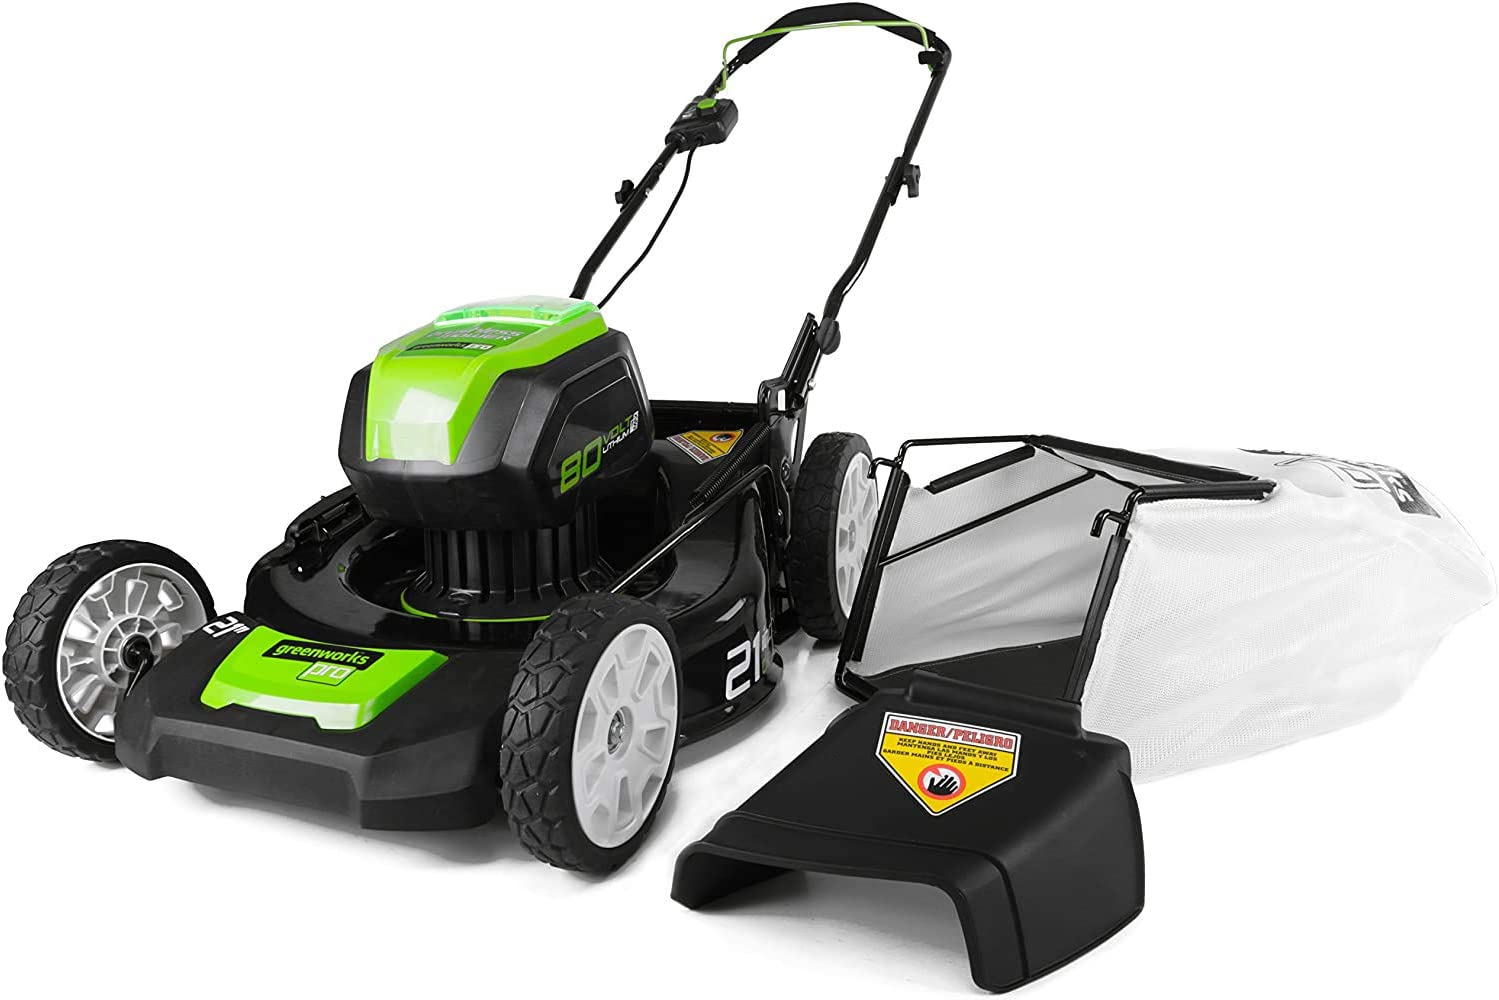 Greenworks 2502202 Pro Push Lawn Mower